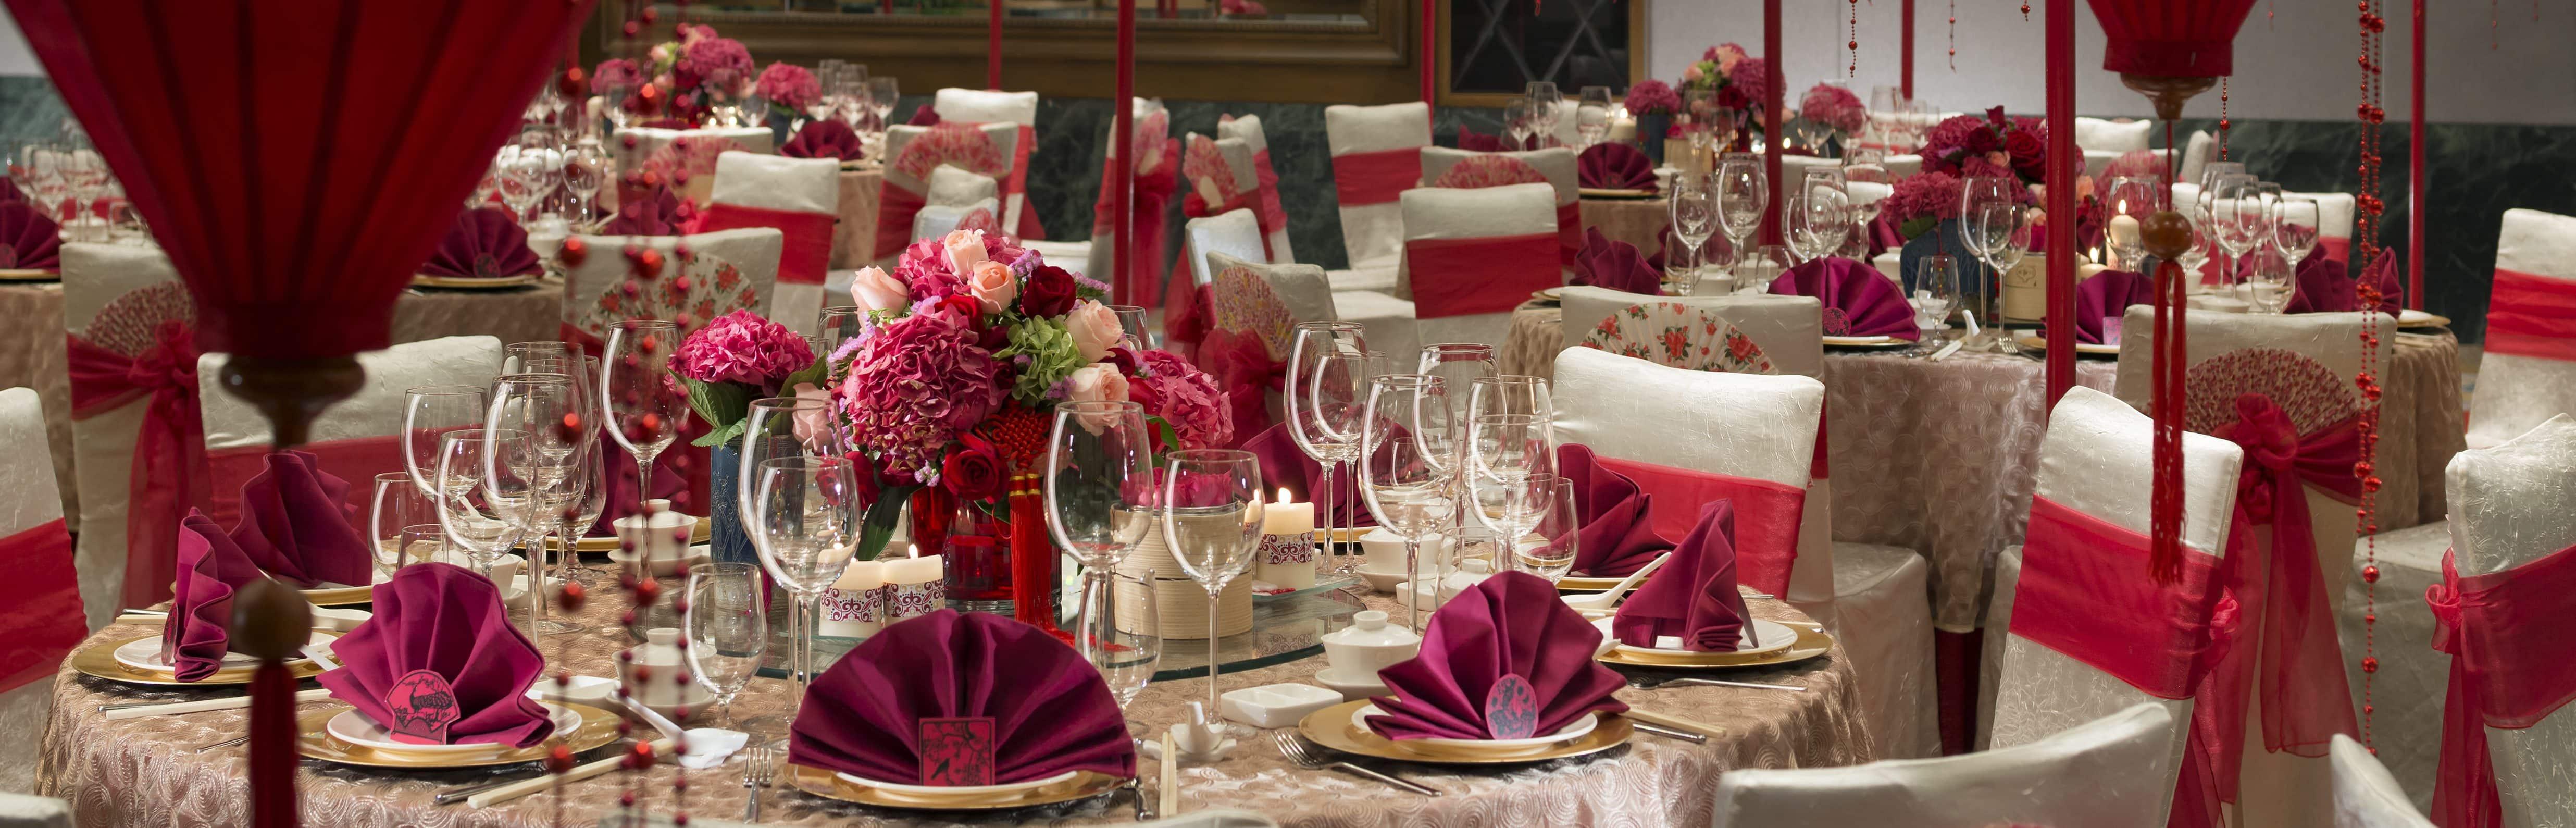 Wedding Gift Ideas Kuala Lumpur : Event Venues in Kuala Lumpur Mandarin Oriental, Kuala Lumpur